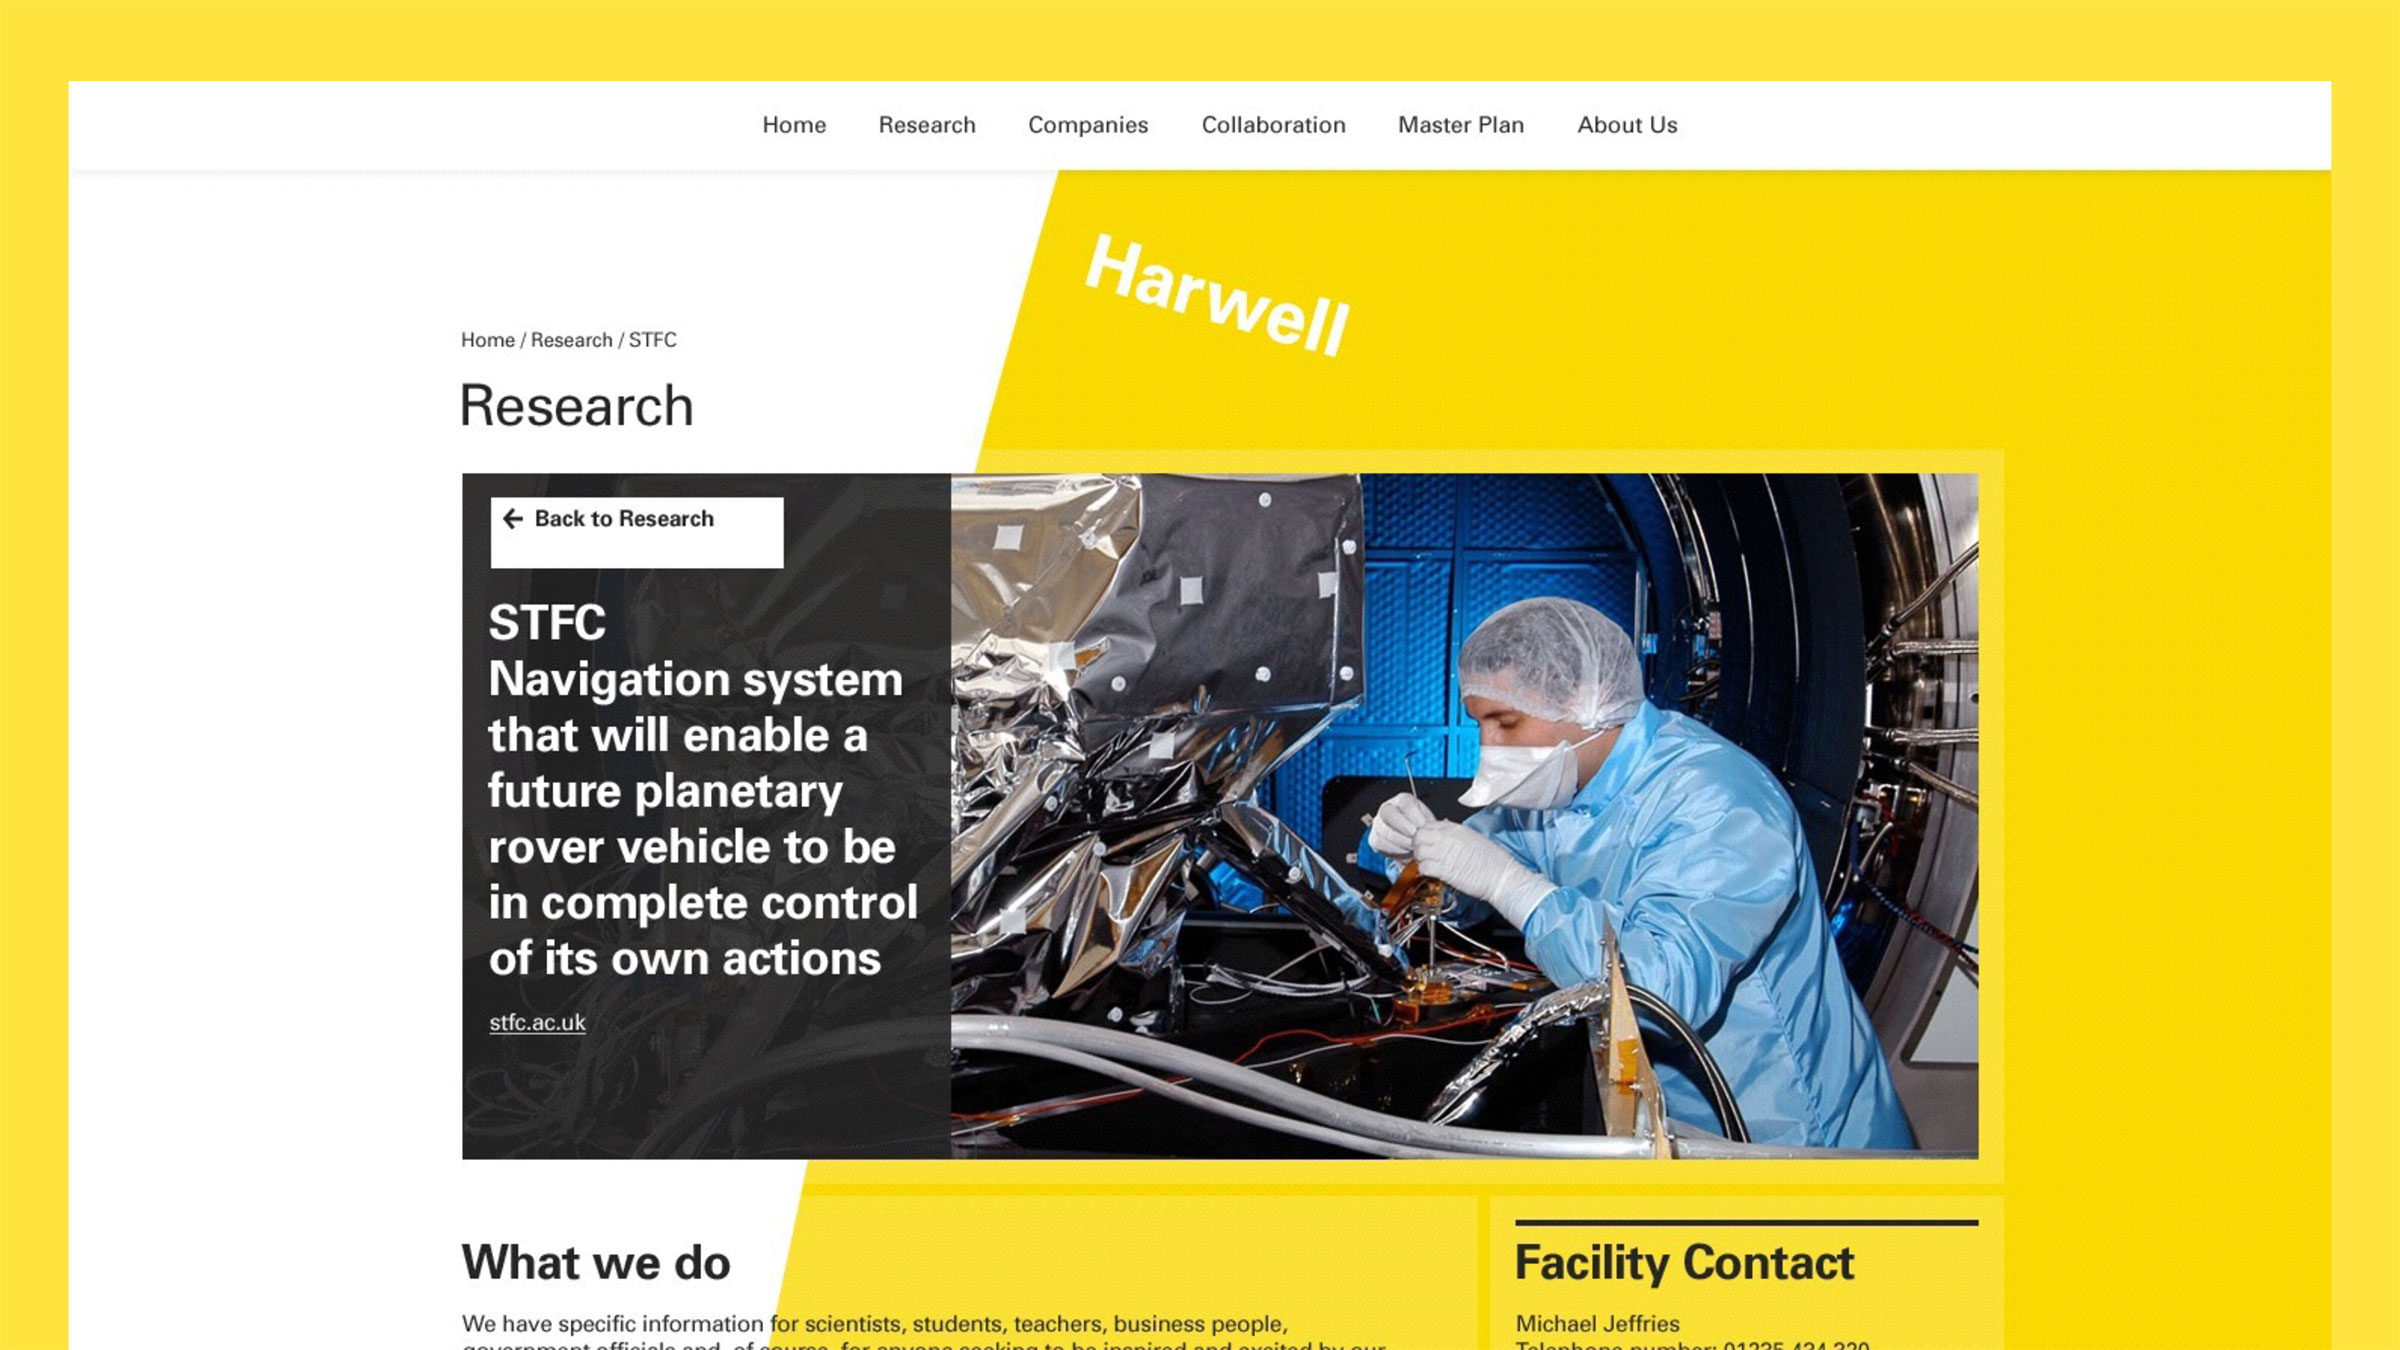 RH-harwell-4.jpg